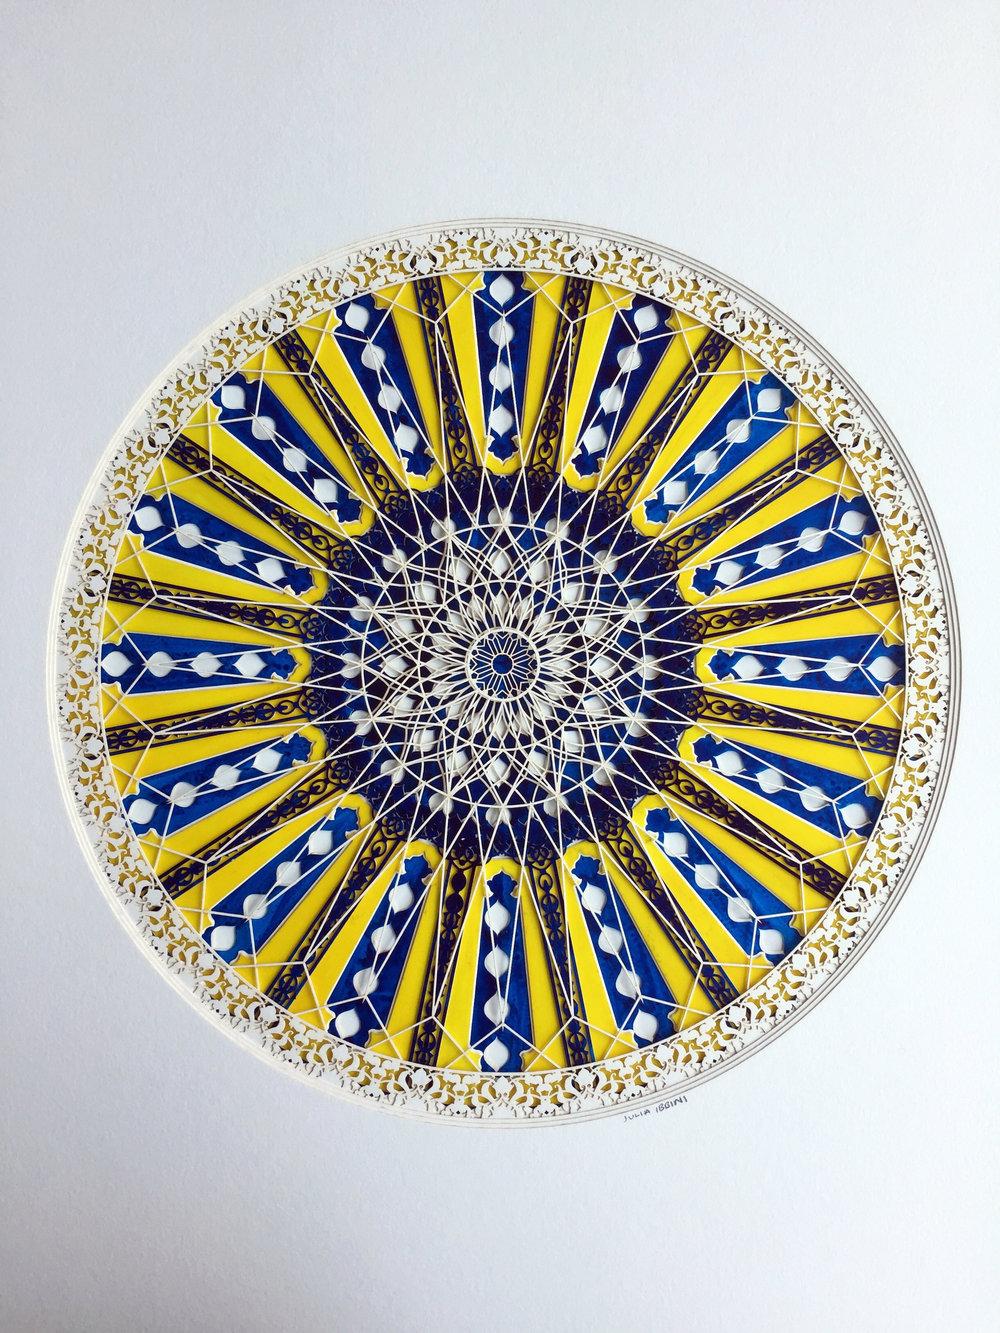 Julia Ibbini,  Aureolin Divided (Circle Studies) , 2017, 19 x 15 x 1.5 inches framed, photo courtesy of the artist